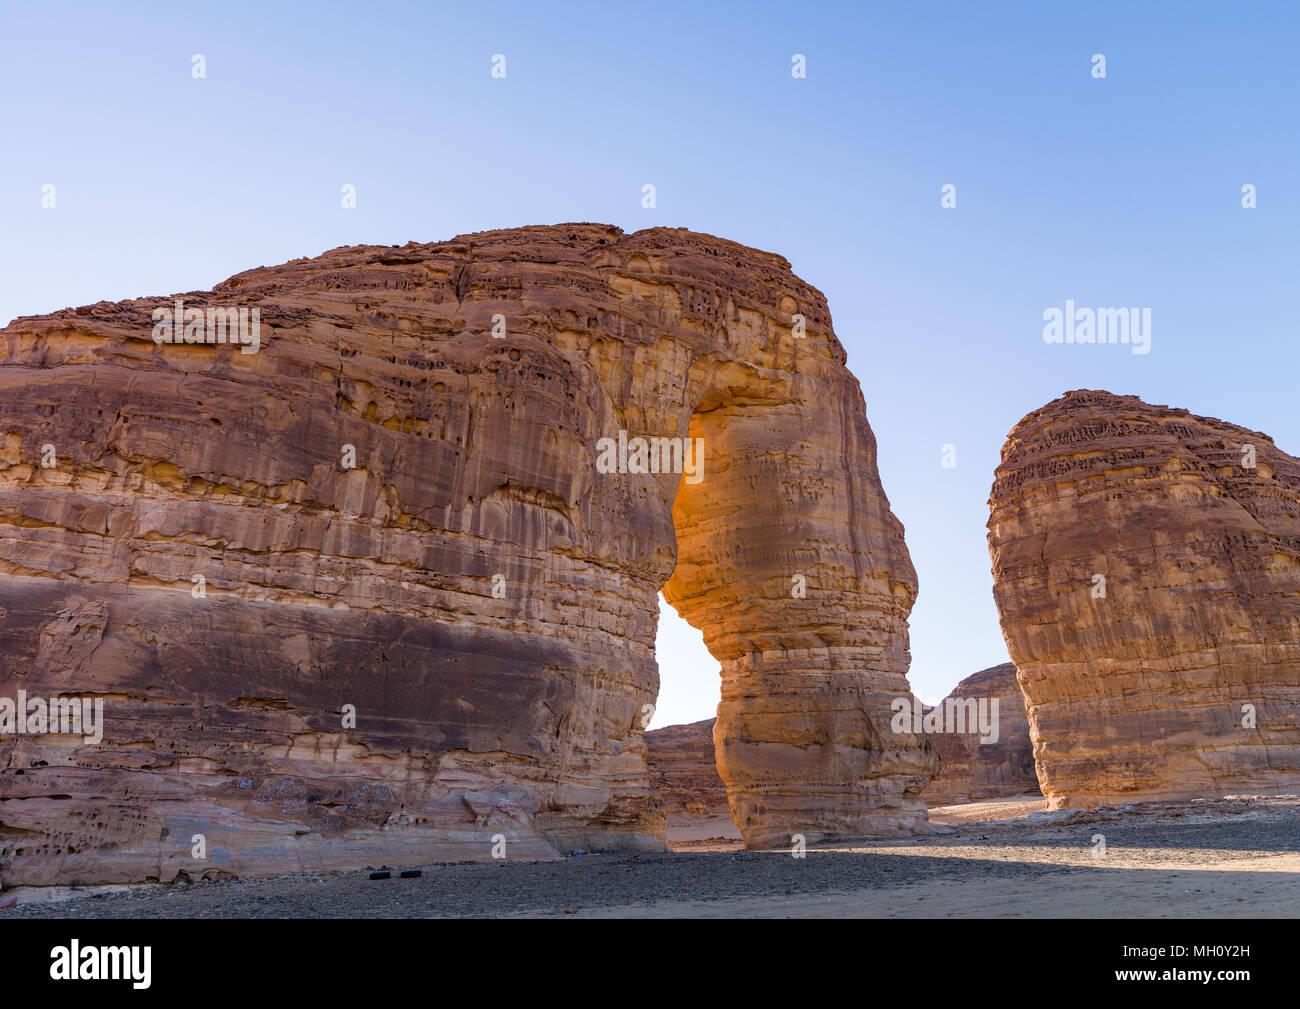 Elephant rock in madain saleh archaeologic site, Al Madinah Province, Al-Ula, Saudi Arabia - Stock Image